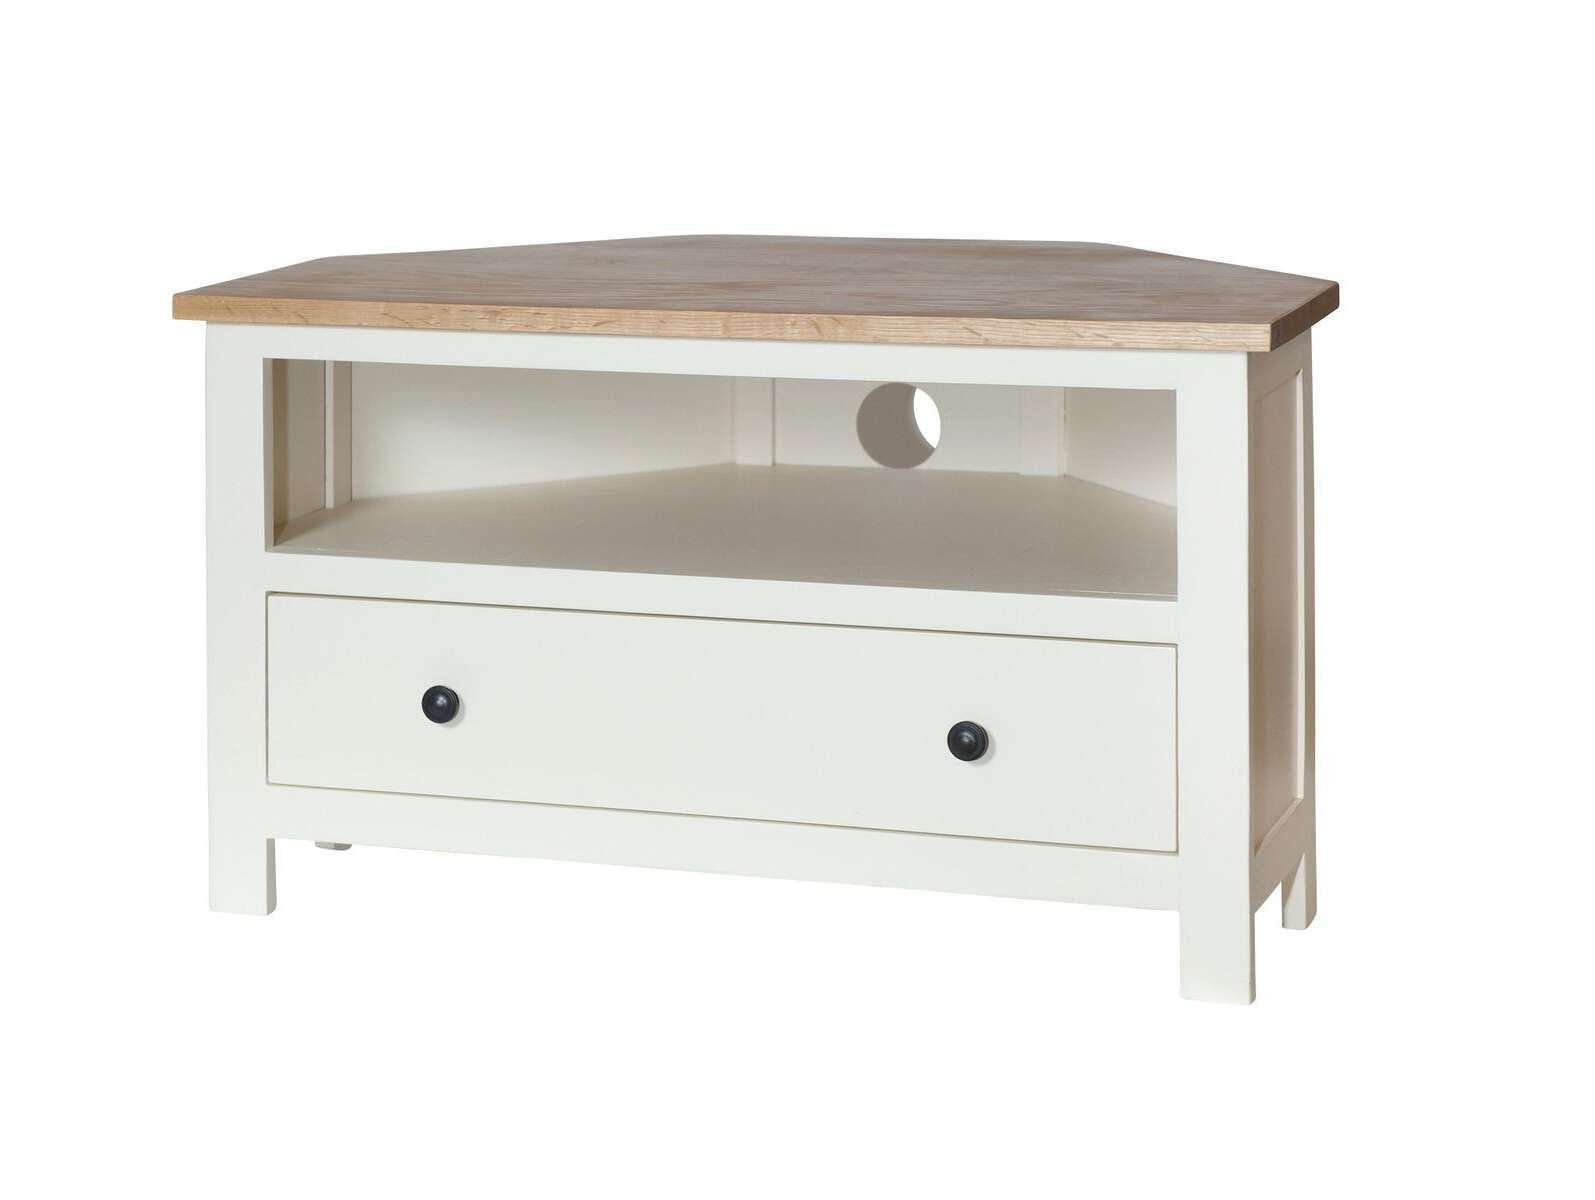 Simply Oak Corner 1 Drawer Tv Cabinet – Oak Furniturehouse Of Oak Throughout Cream Tv Cabinets (View 19 of 20)